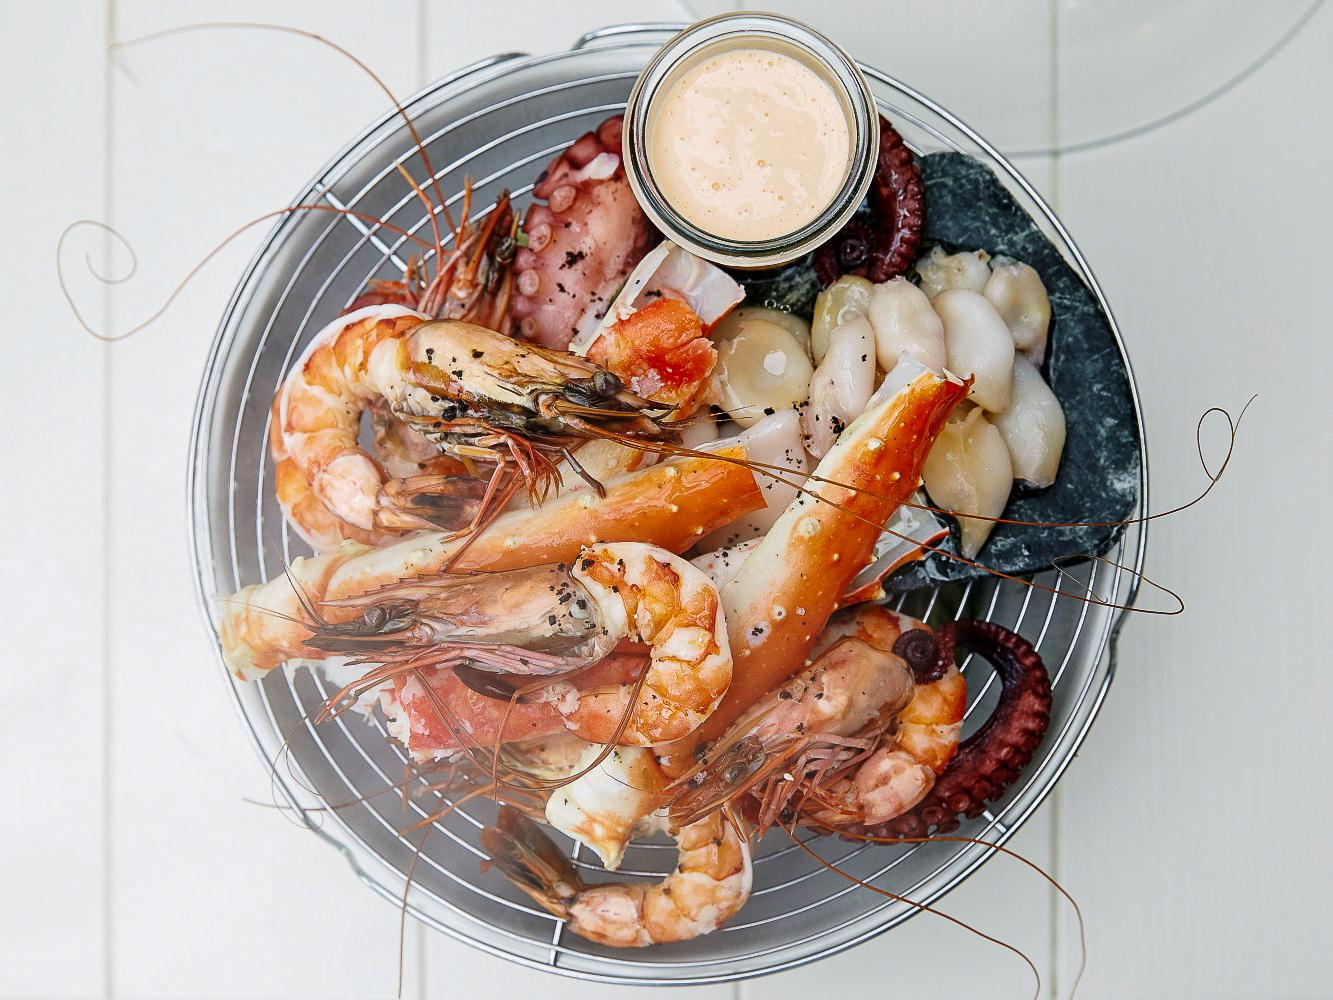 Плато морепродуктов